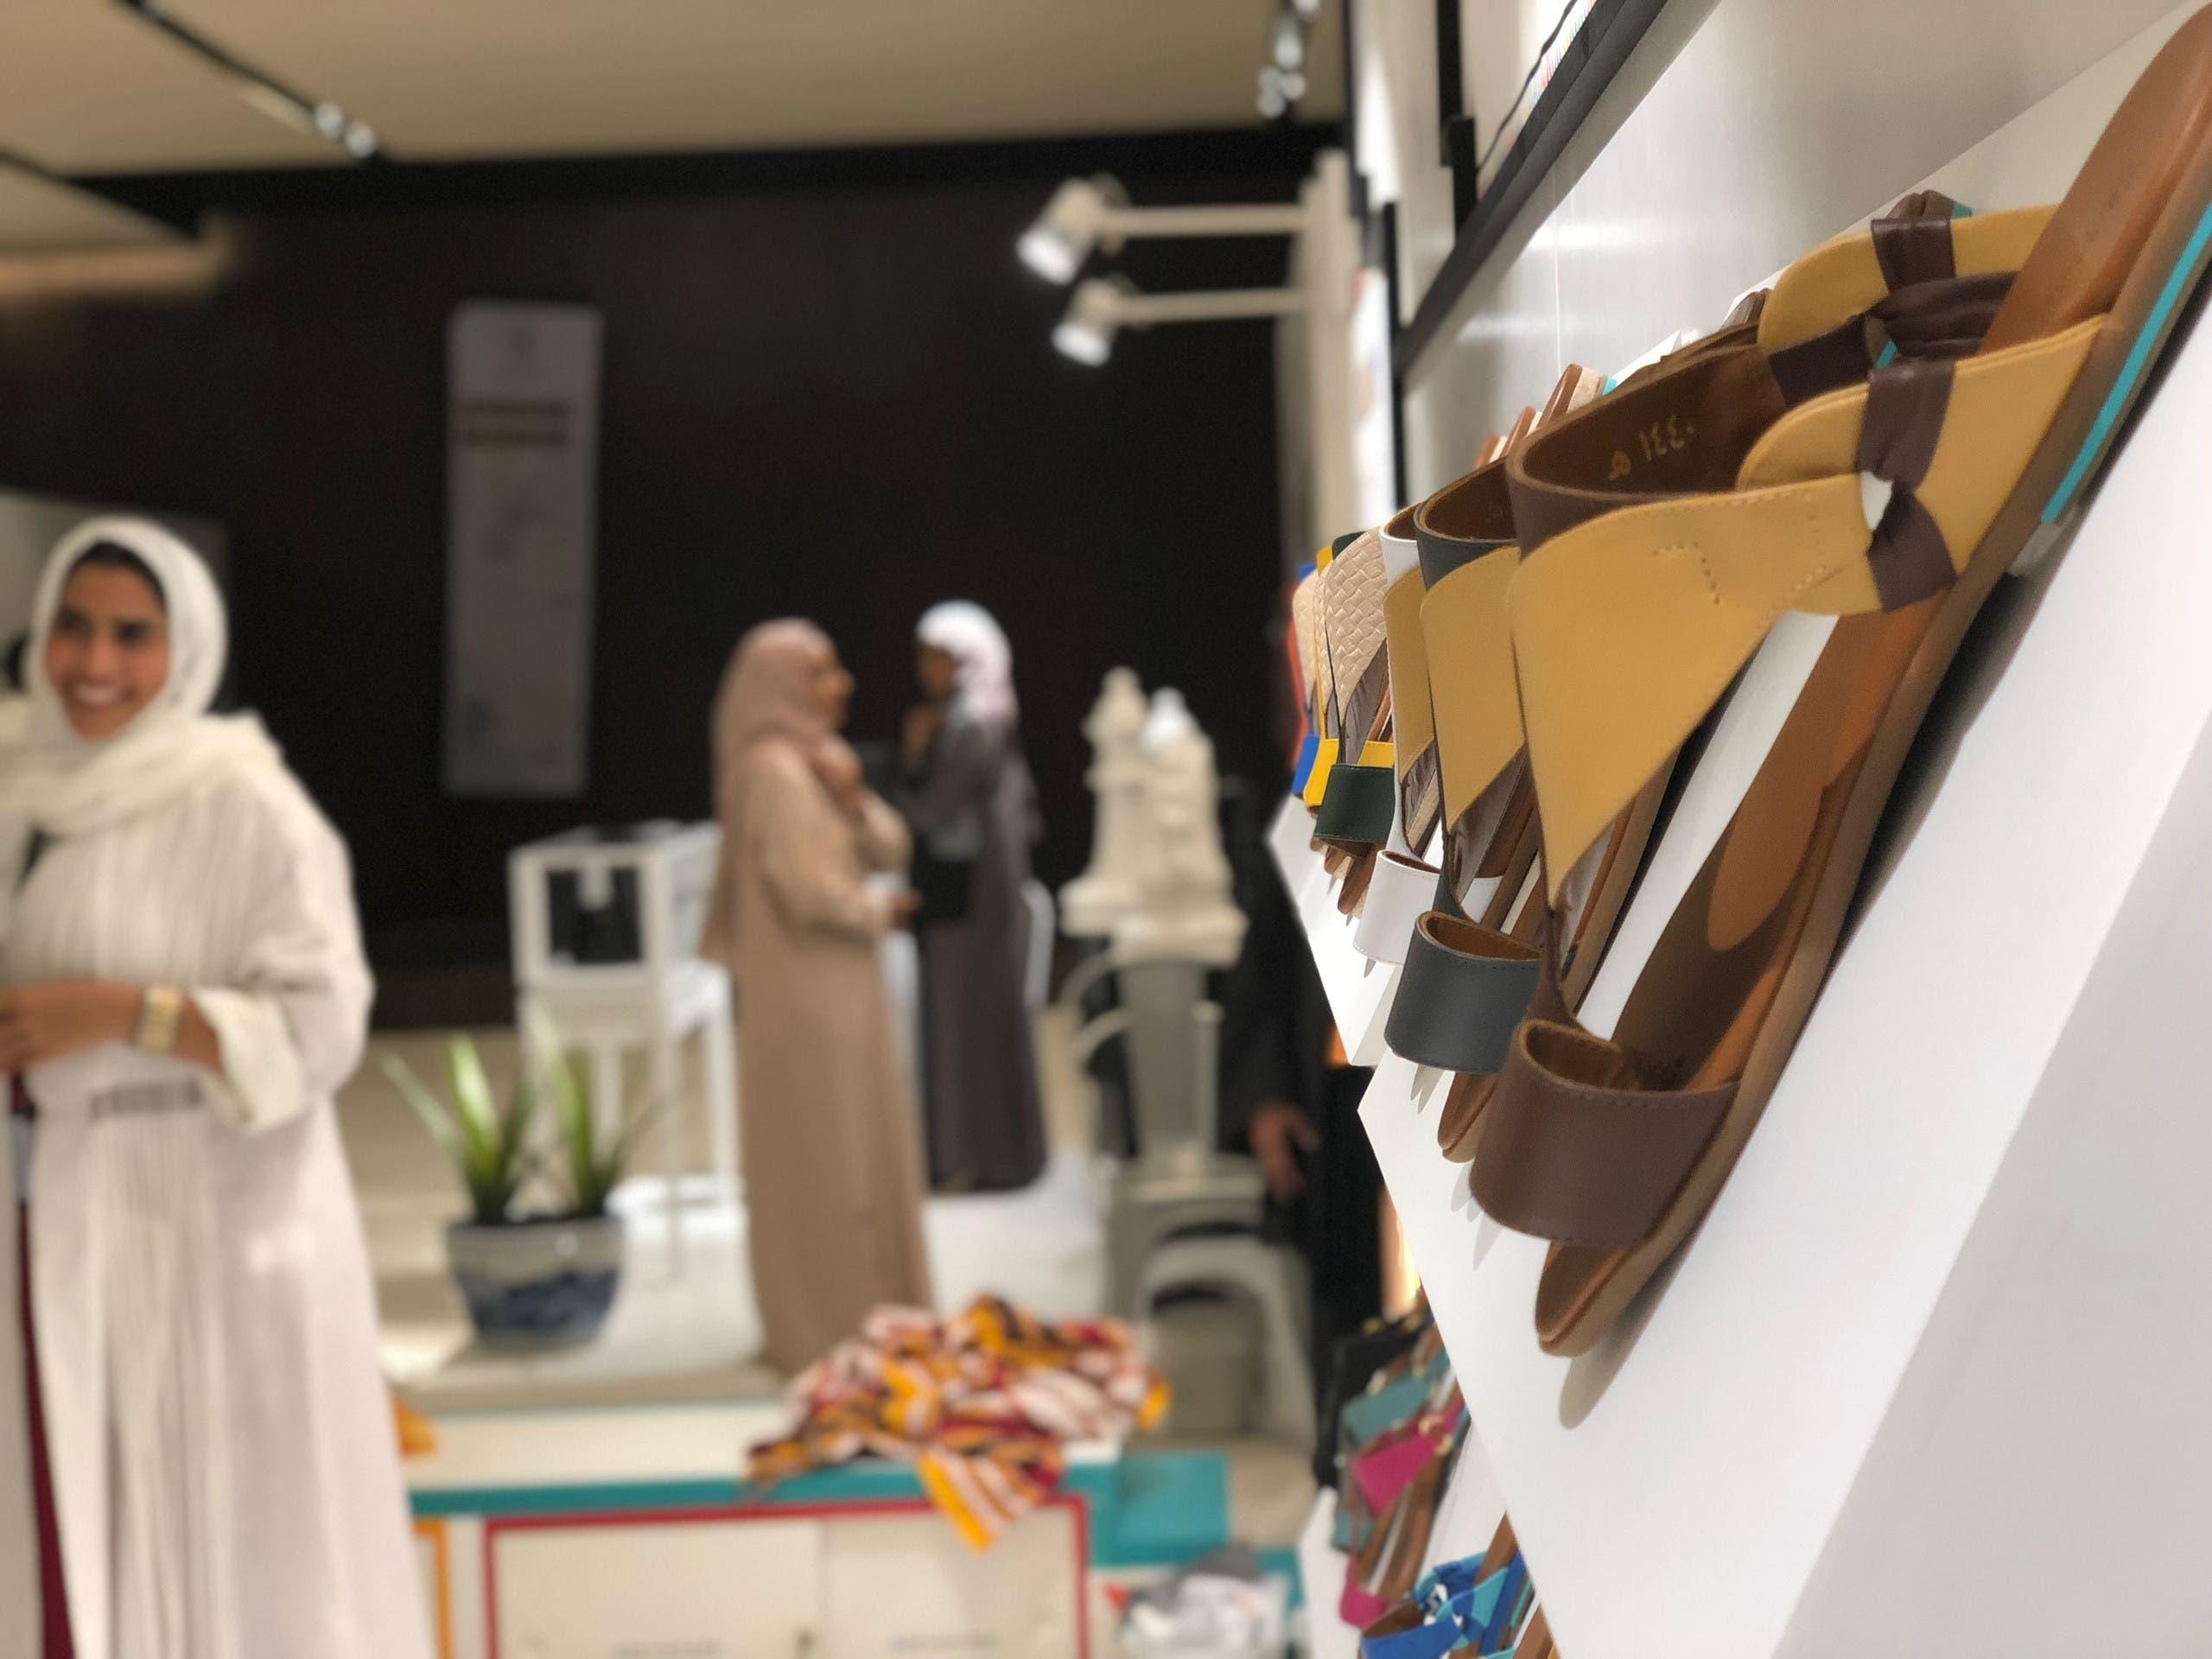 High-end footwear on display at Tamashee's booth, with al-Qatt al-Assiri being their seasonal highlight (Photo: Ali Alshabnan)